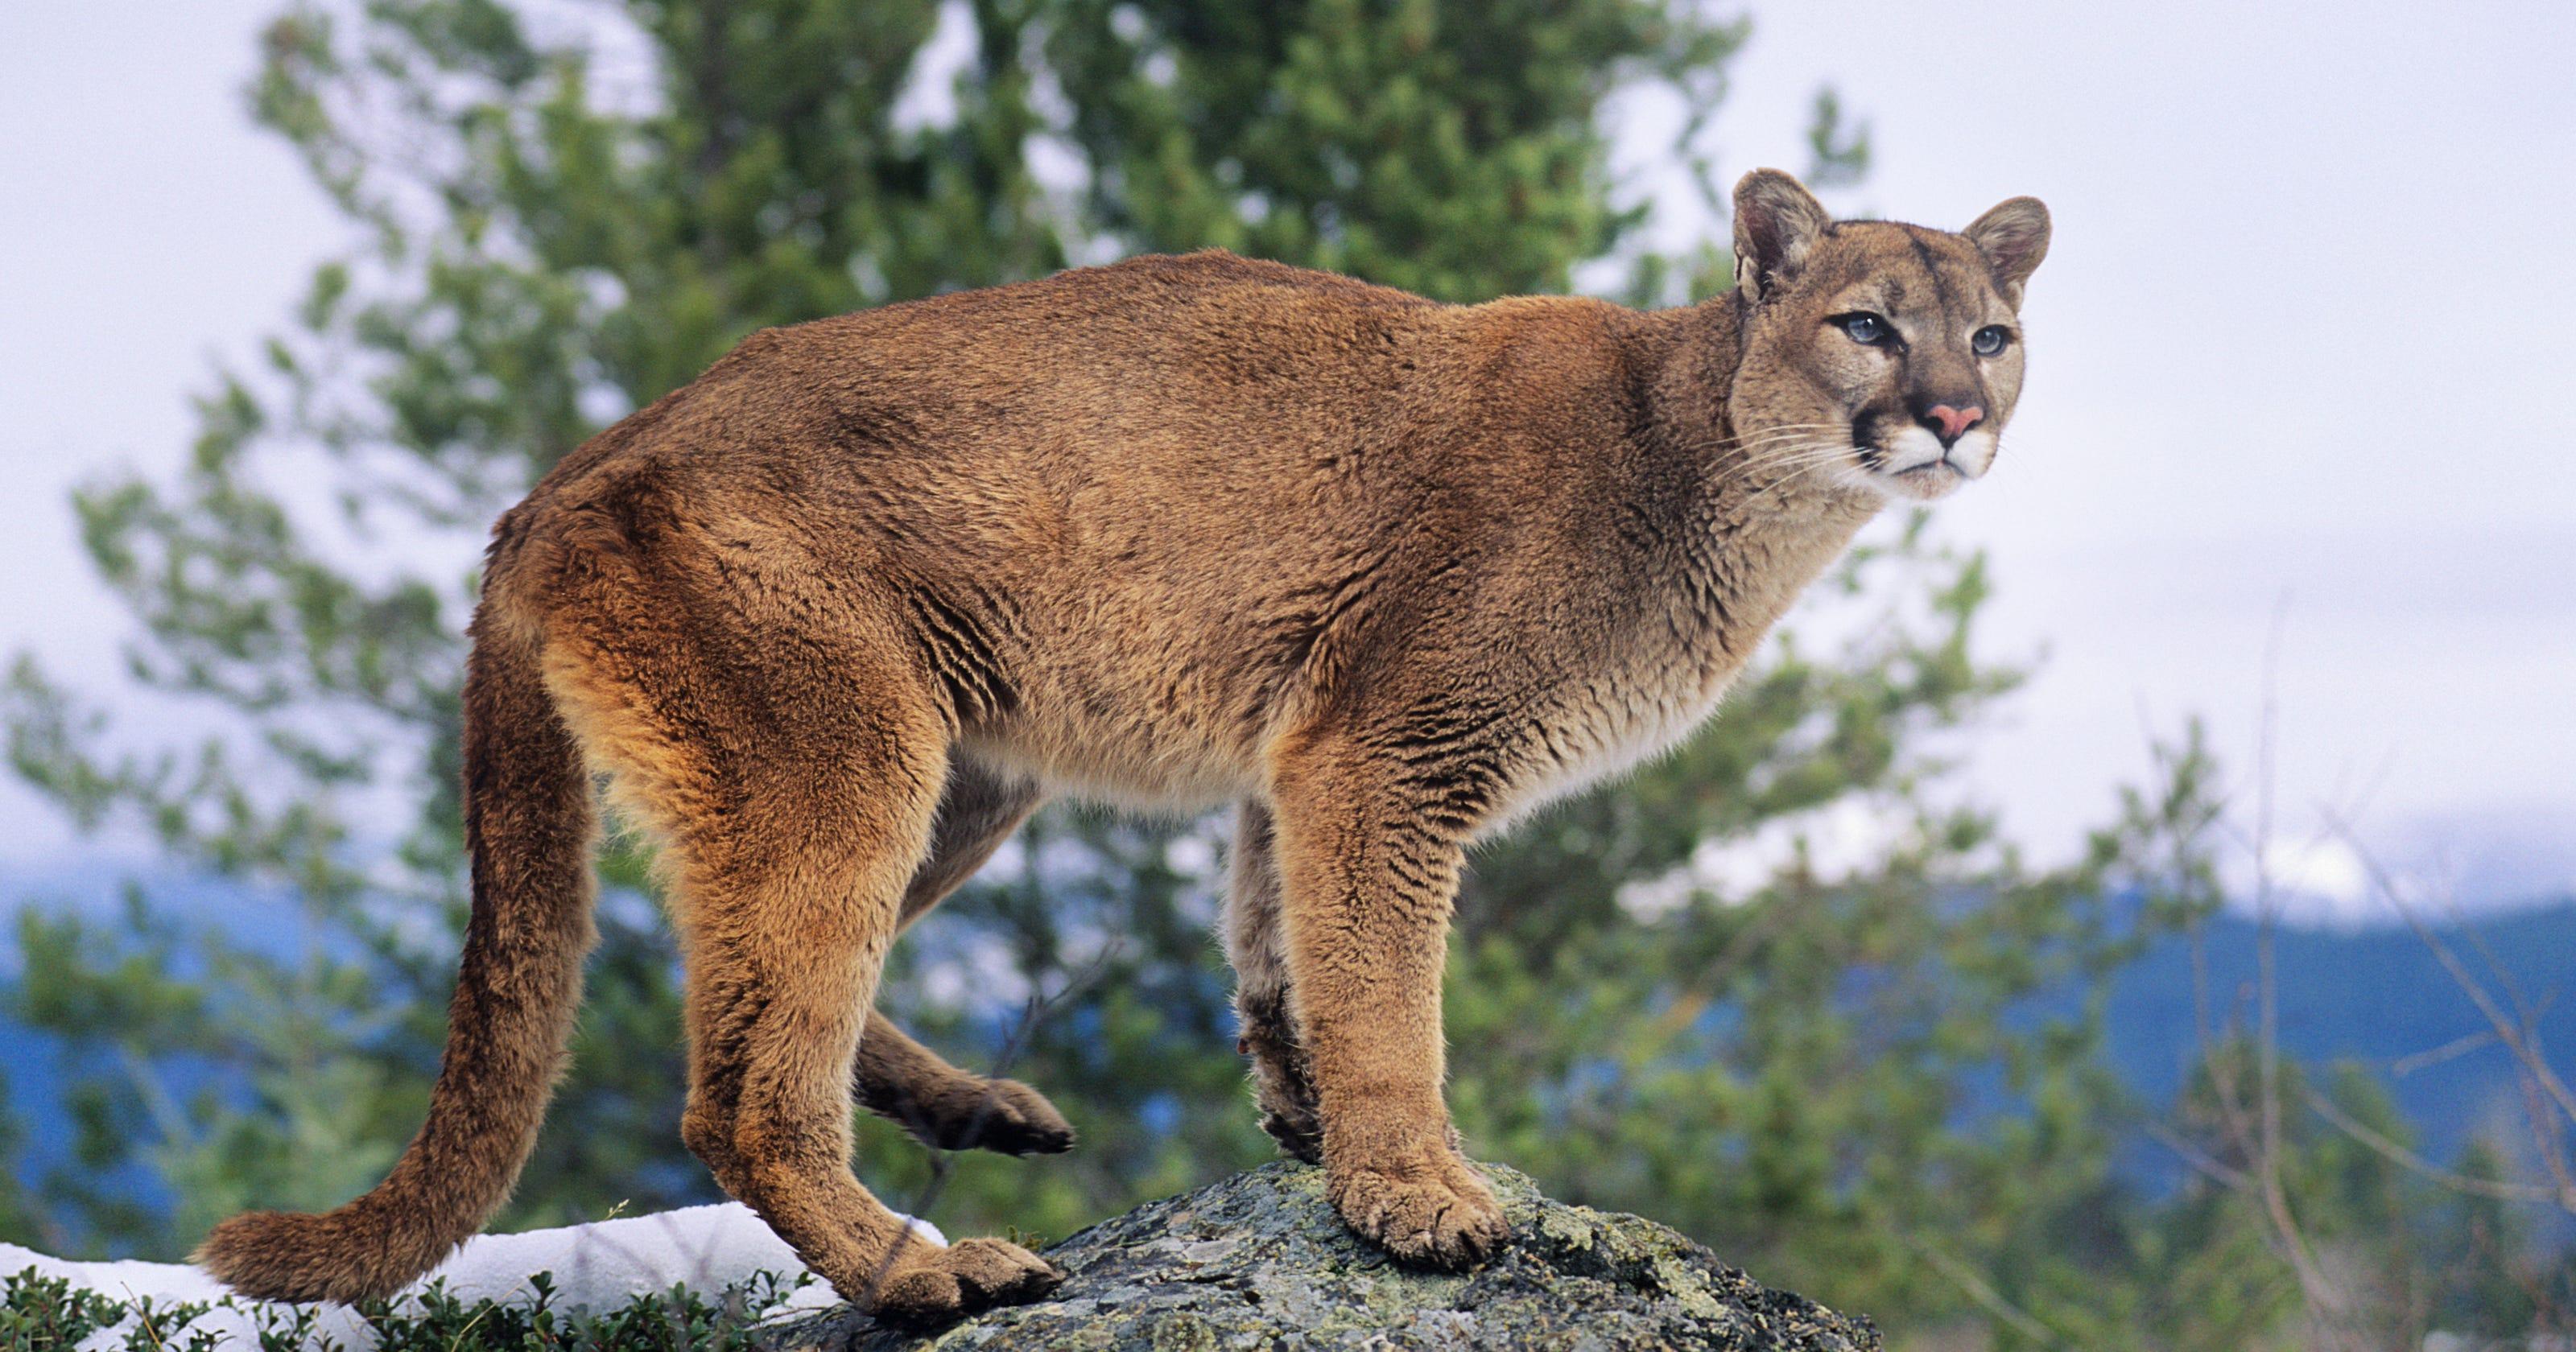 Mountain lion captured in backyard of Montana Vista home